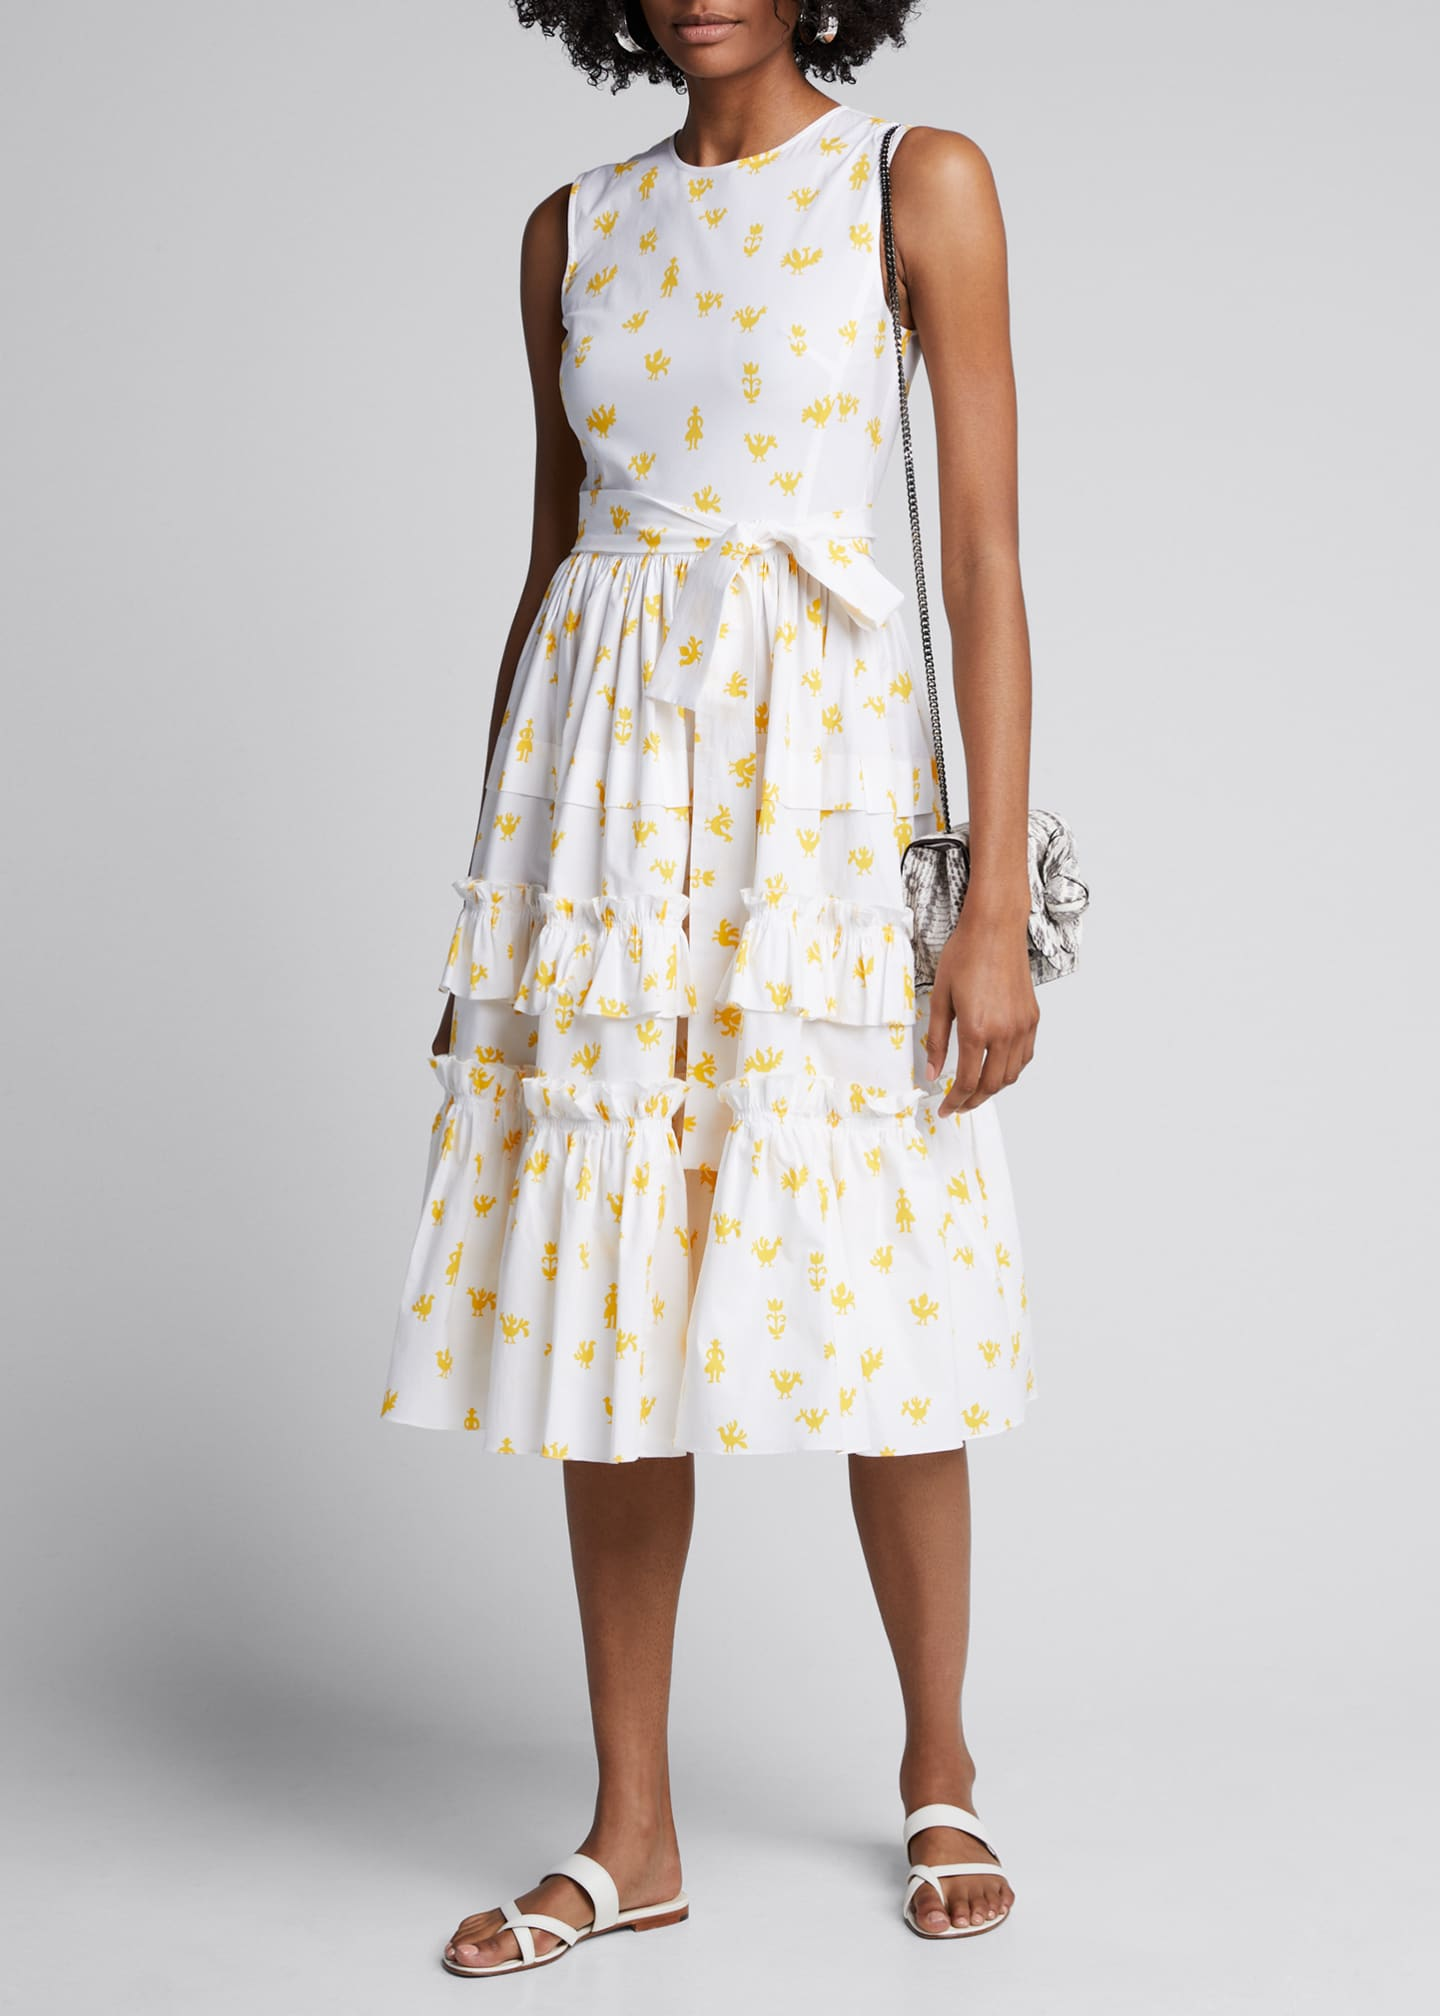 Carolina Herrera Printed Poplin Ruffle Tiered Dress